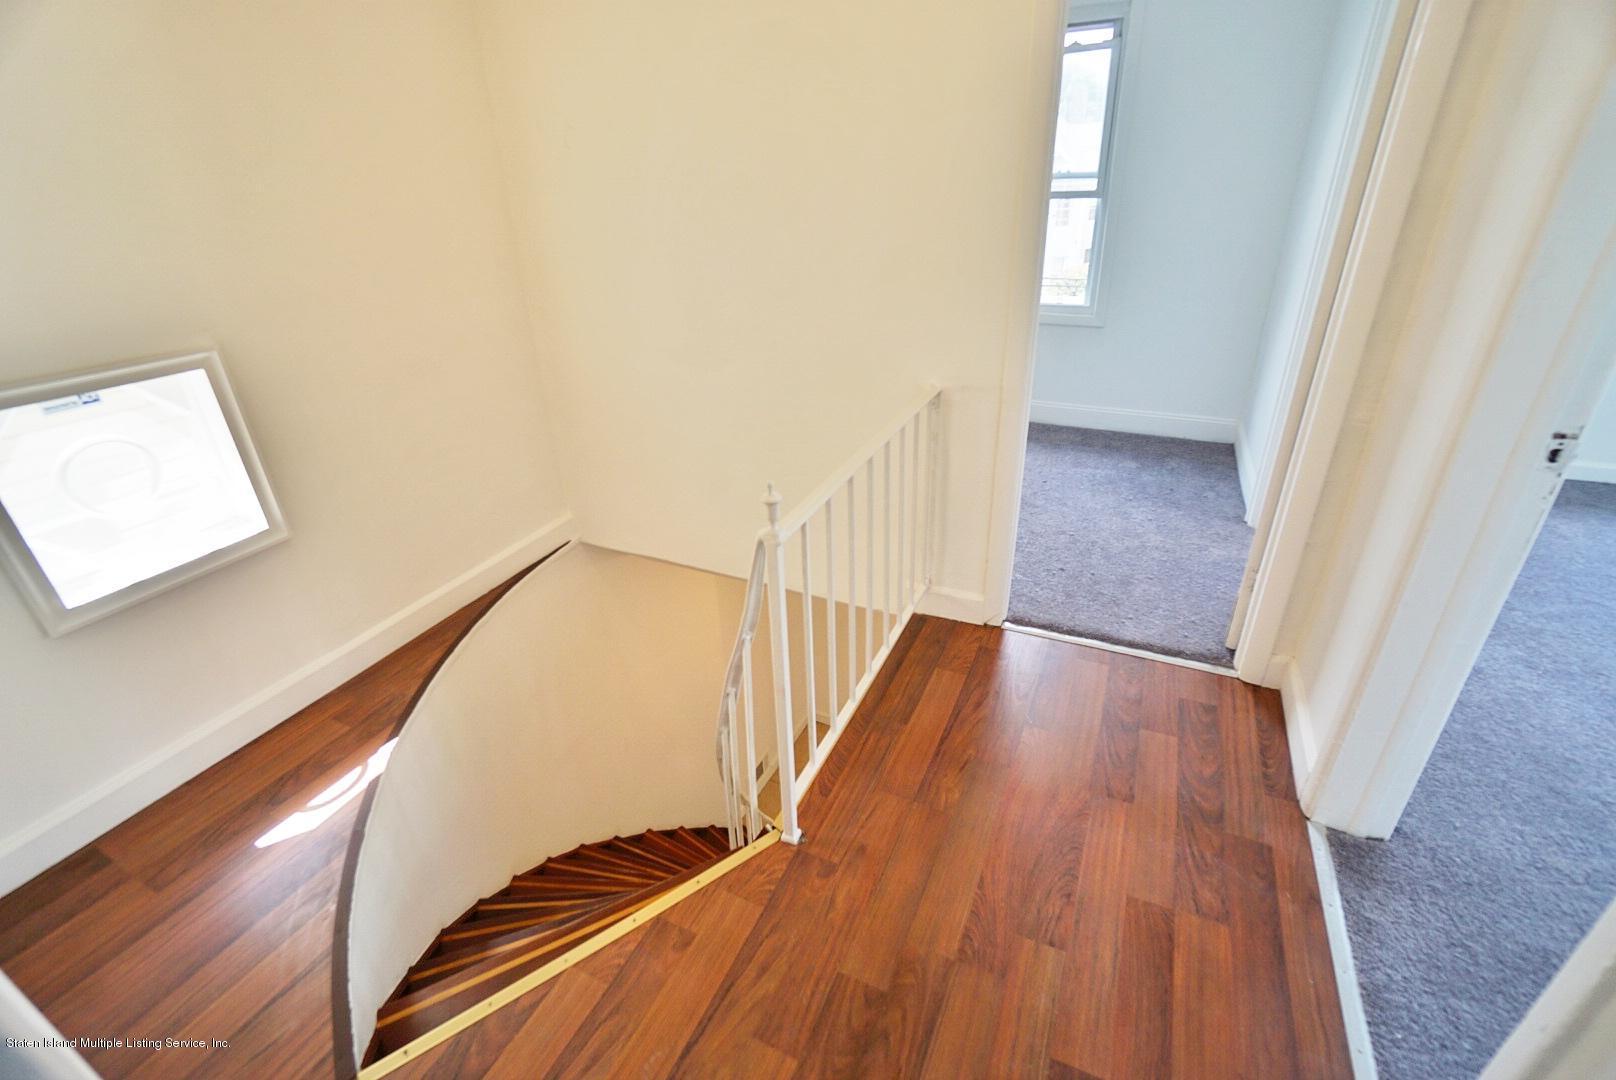 Single Family - Detached 53 Dubois Avenue  Staten Island, NY 10310, MLS-1128749-30